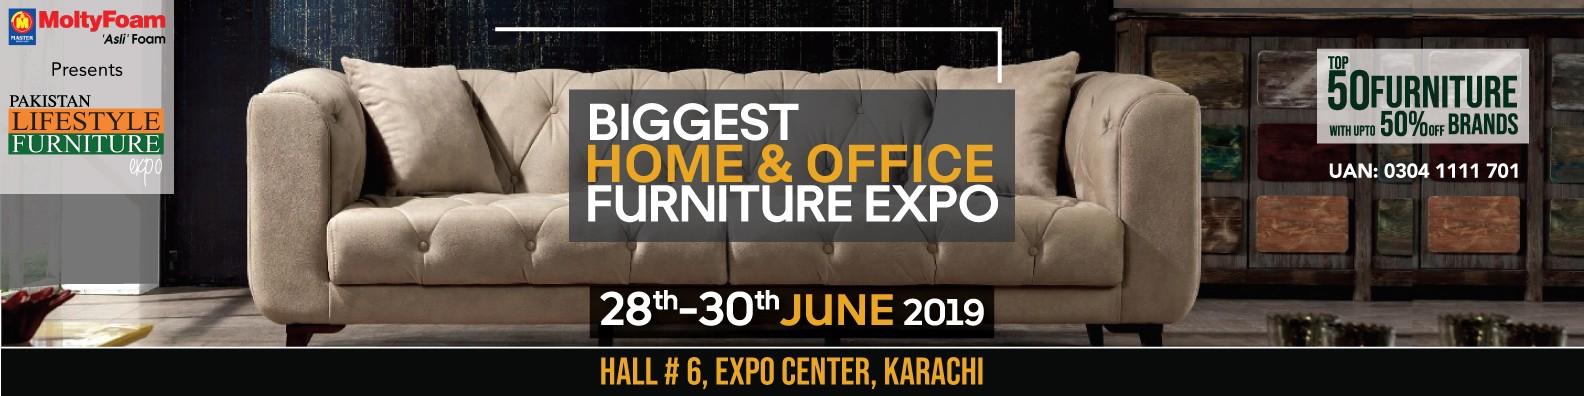 Pakistan Lifestyle Furniture Expo Linkedin